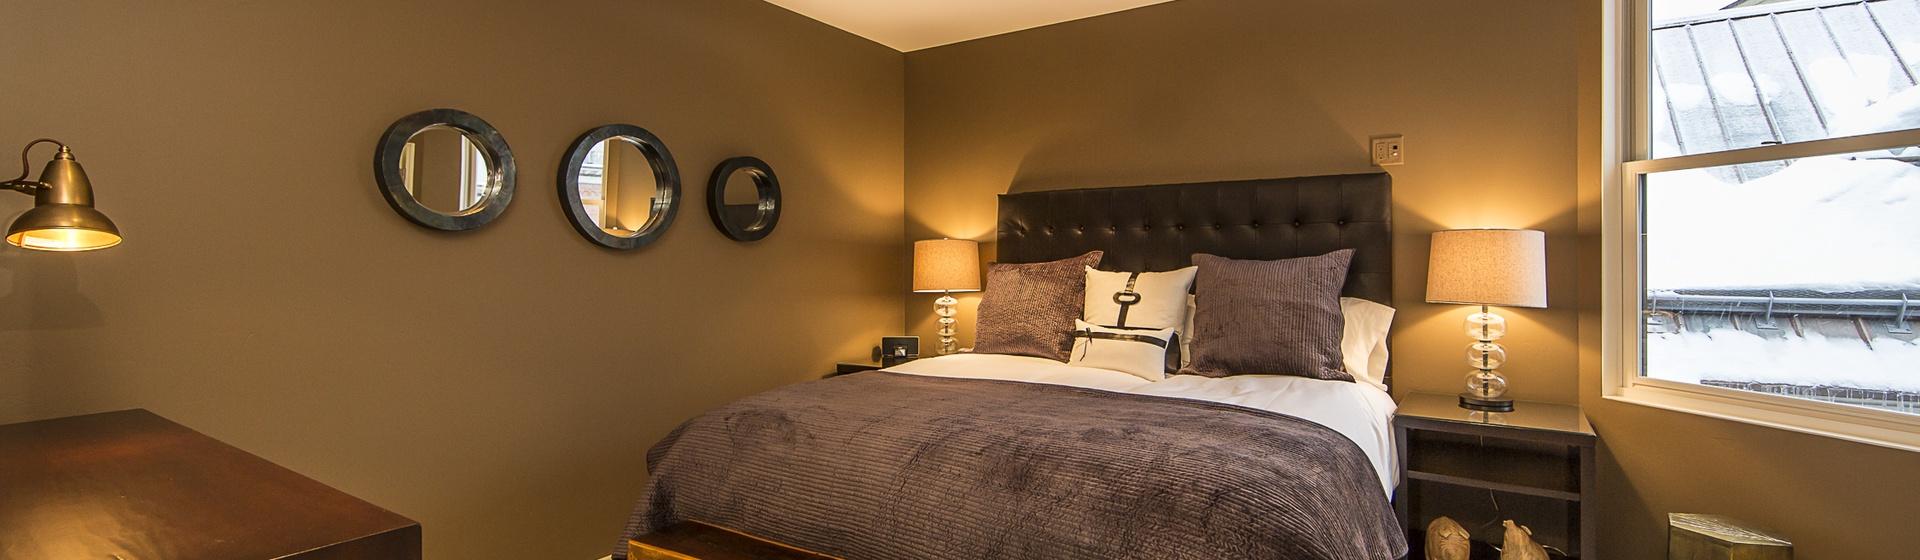 30-Telluride-Trulux-Penthouse-MasterBedroom3.jpg